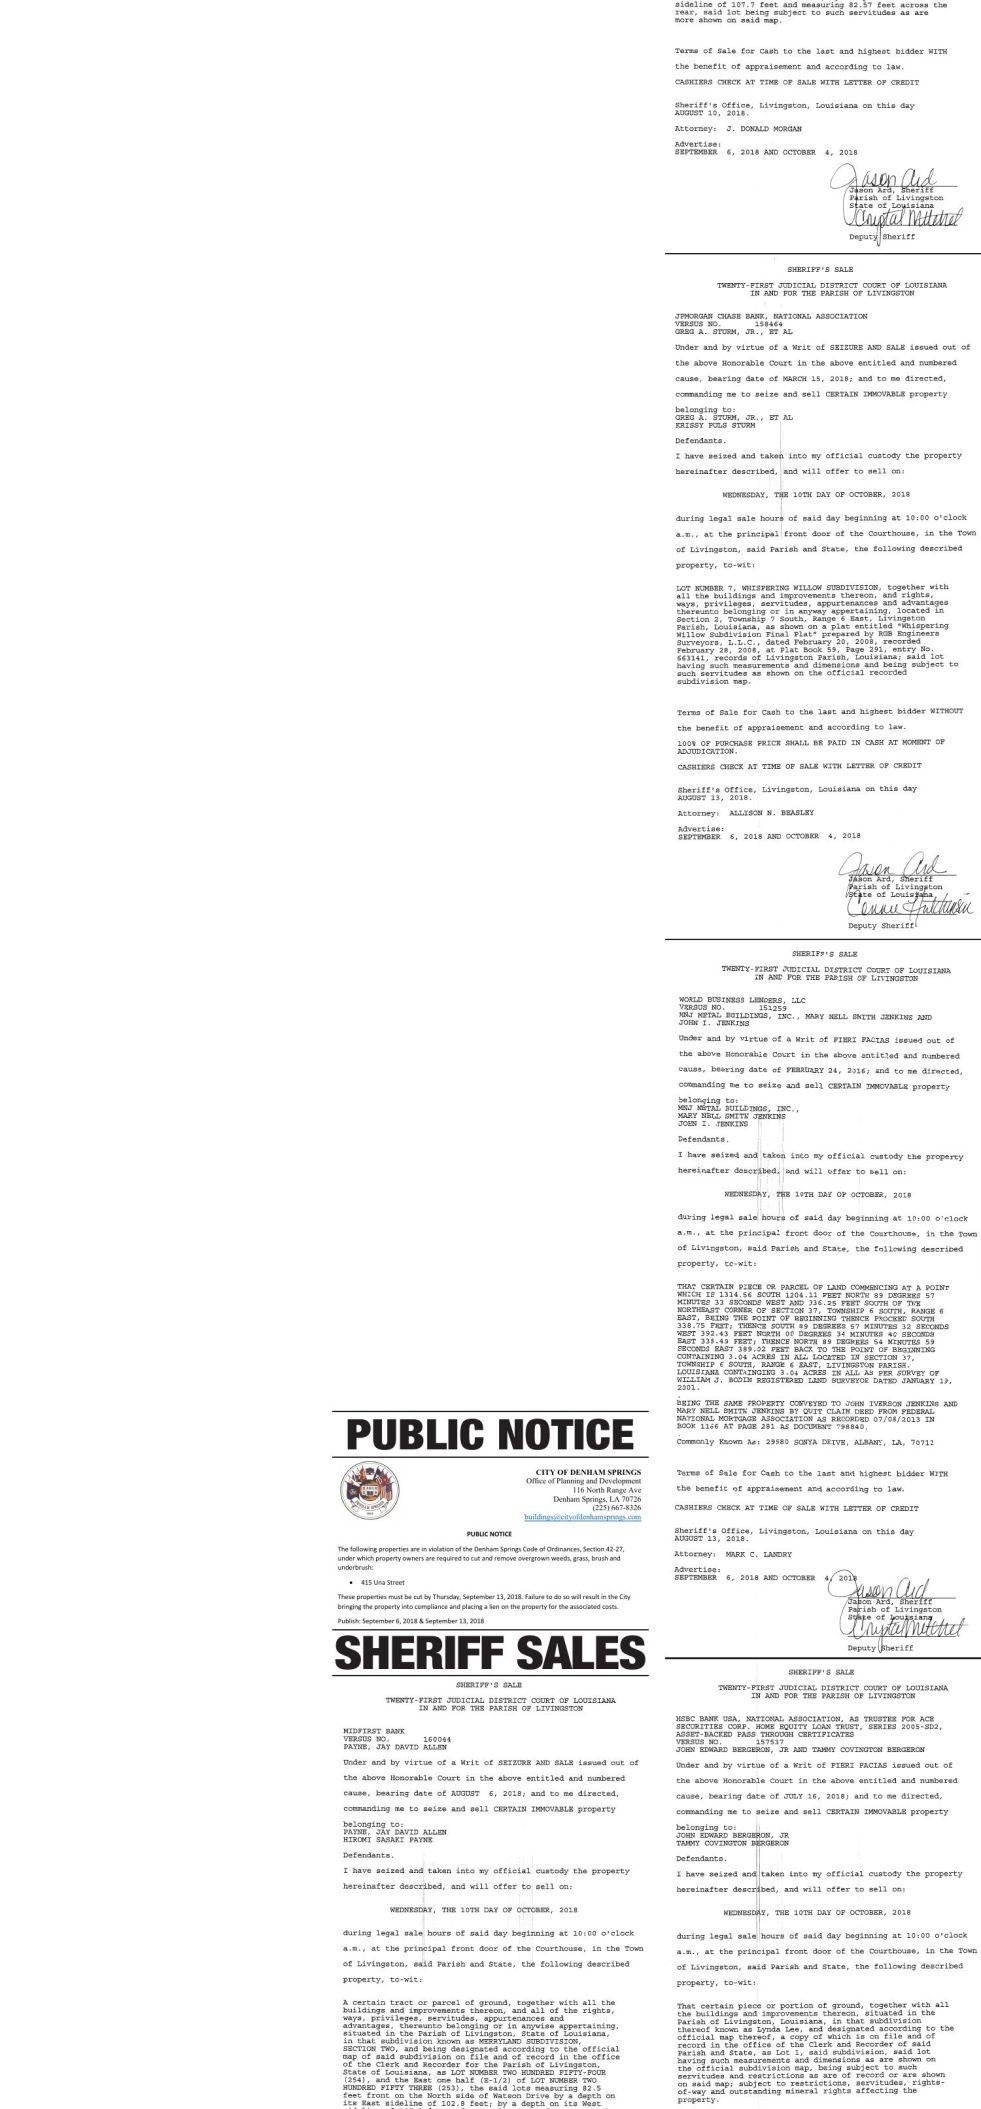 Public Notices published September 6, 2018